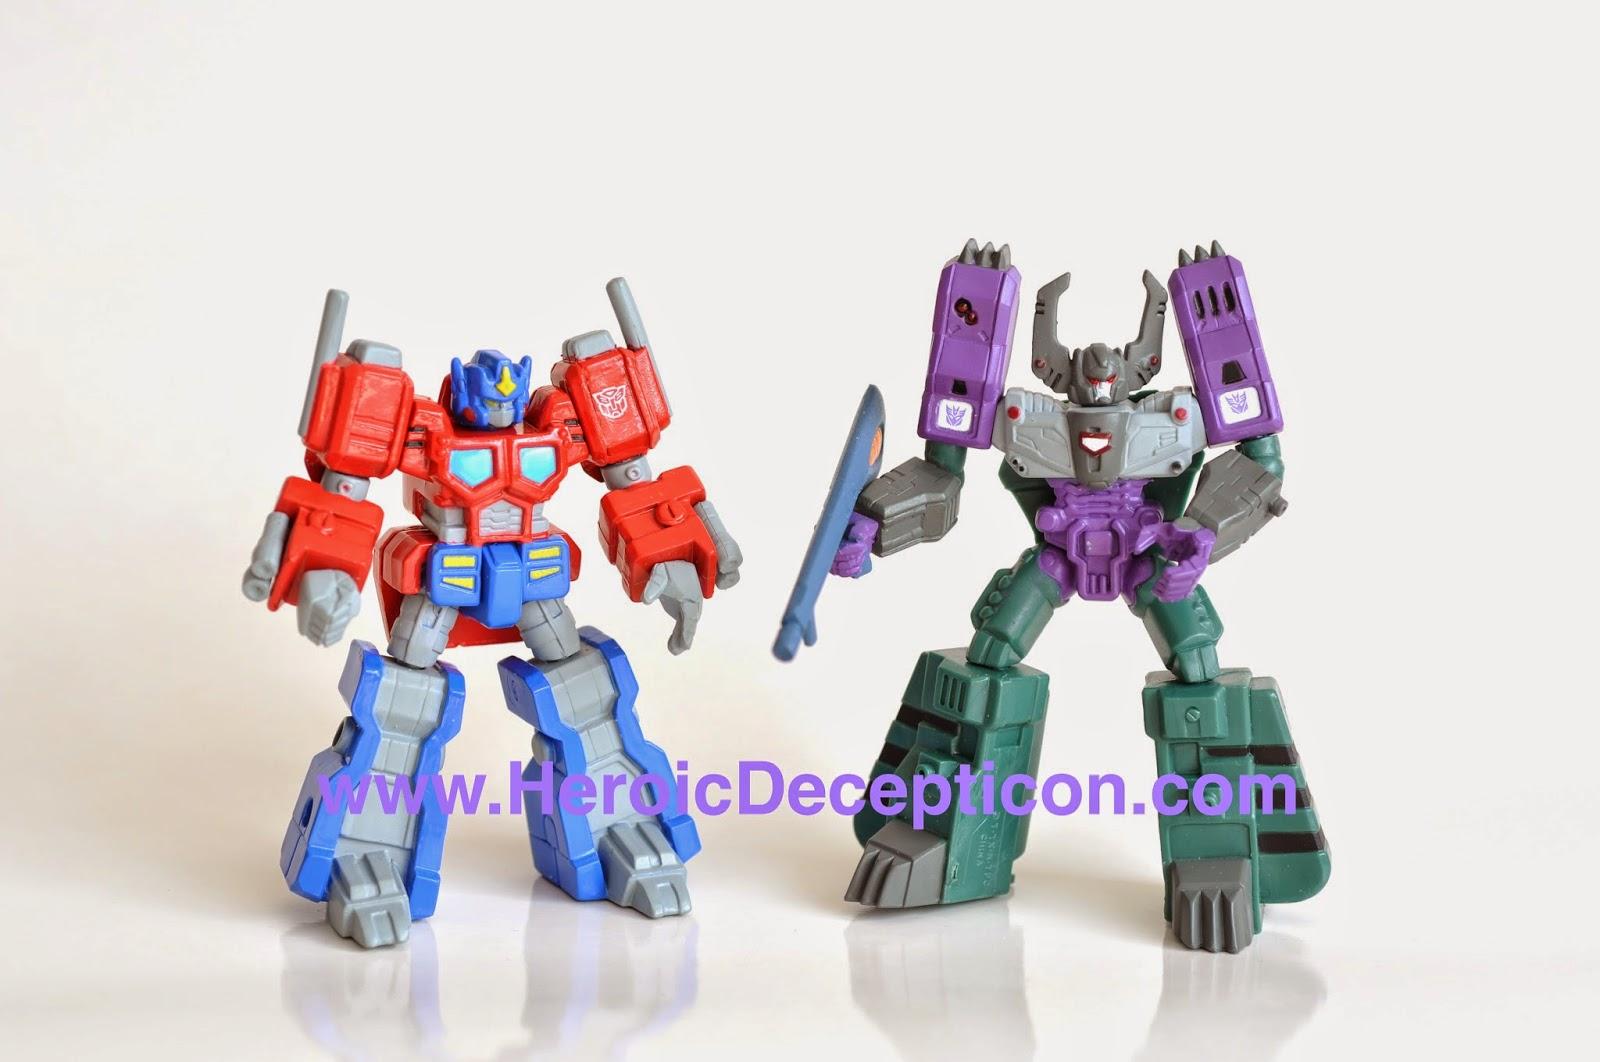 Heroic Decepticon: Takara Transformers SCFs - ACT 9 Chase figures